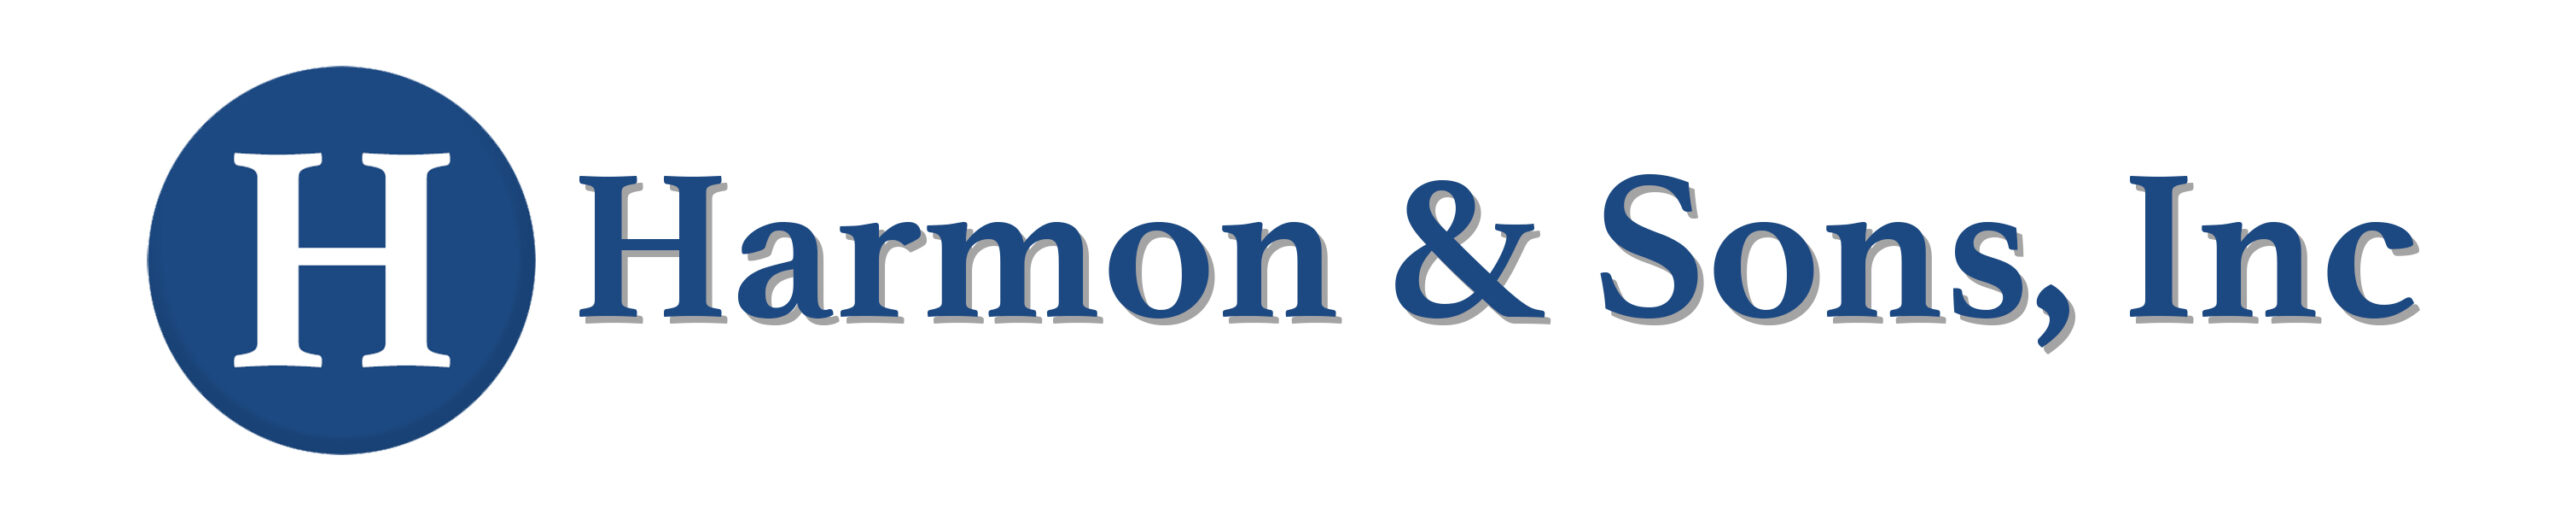 Harmon & Sons, Inc